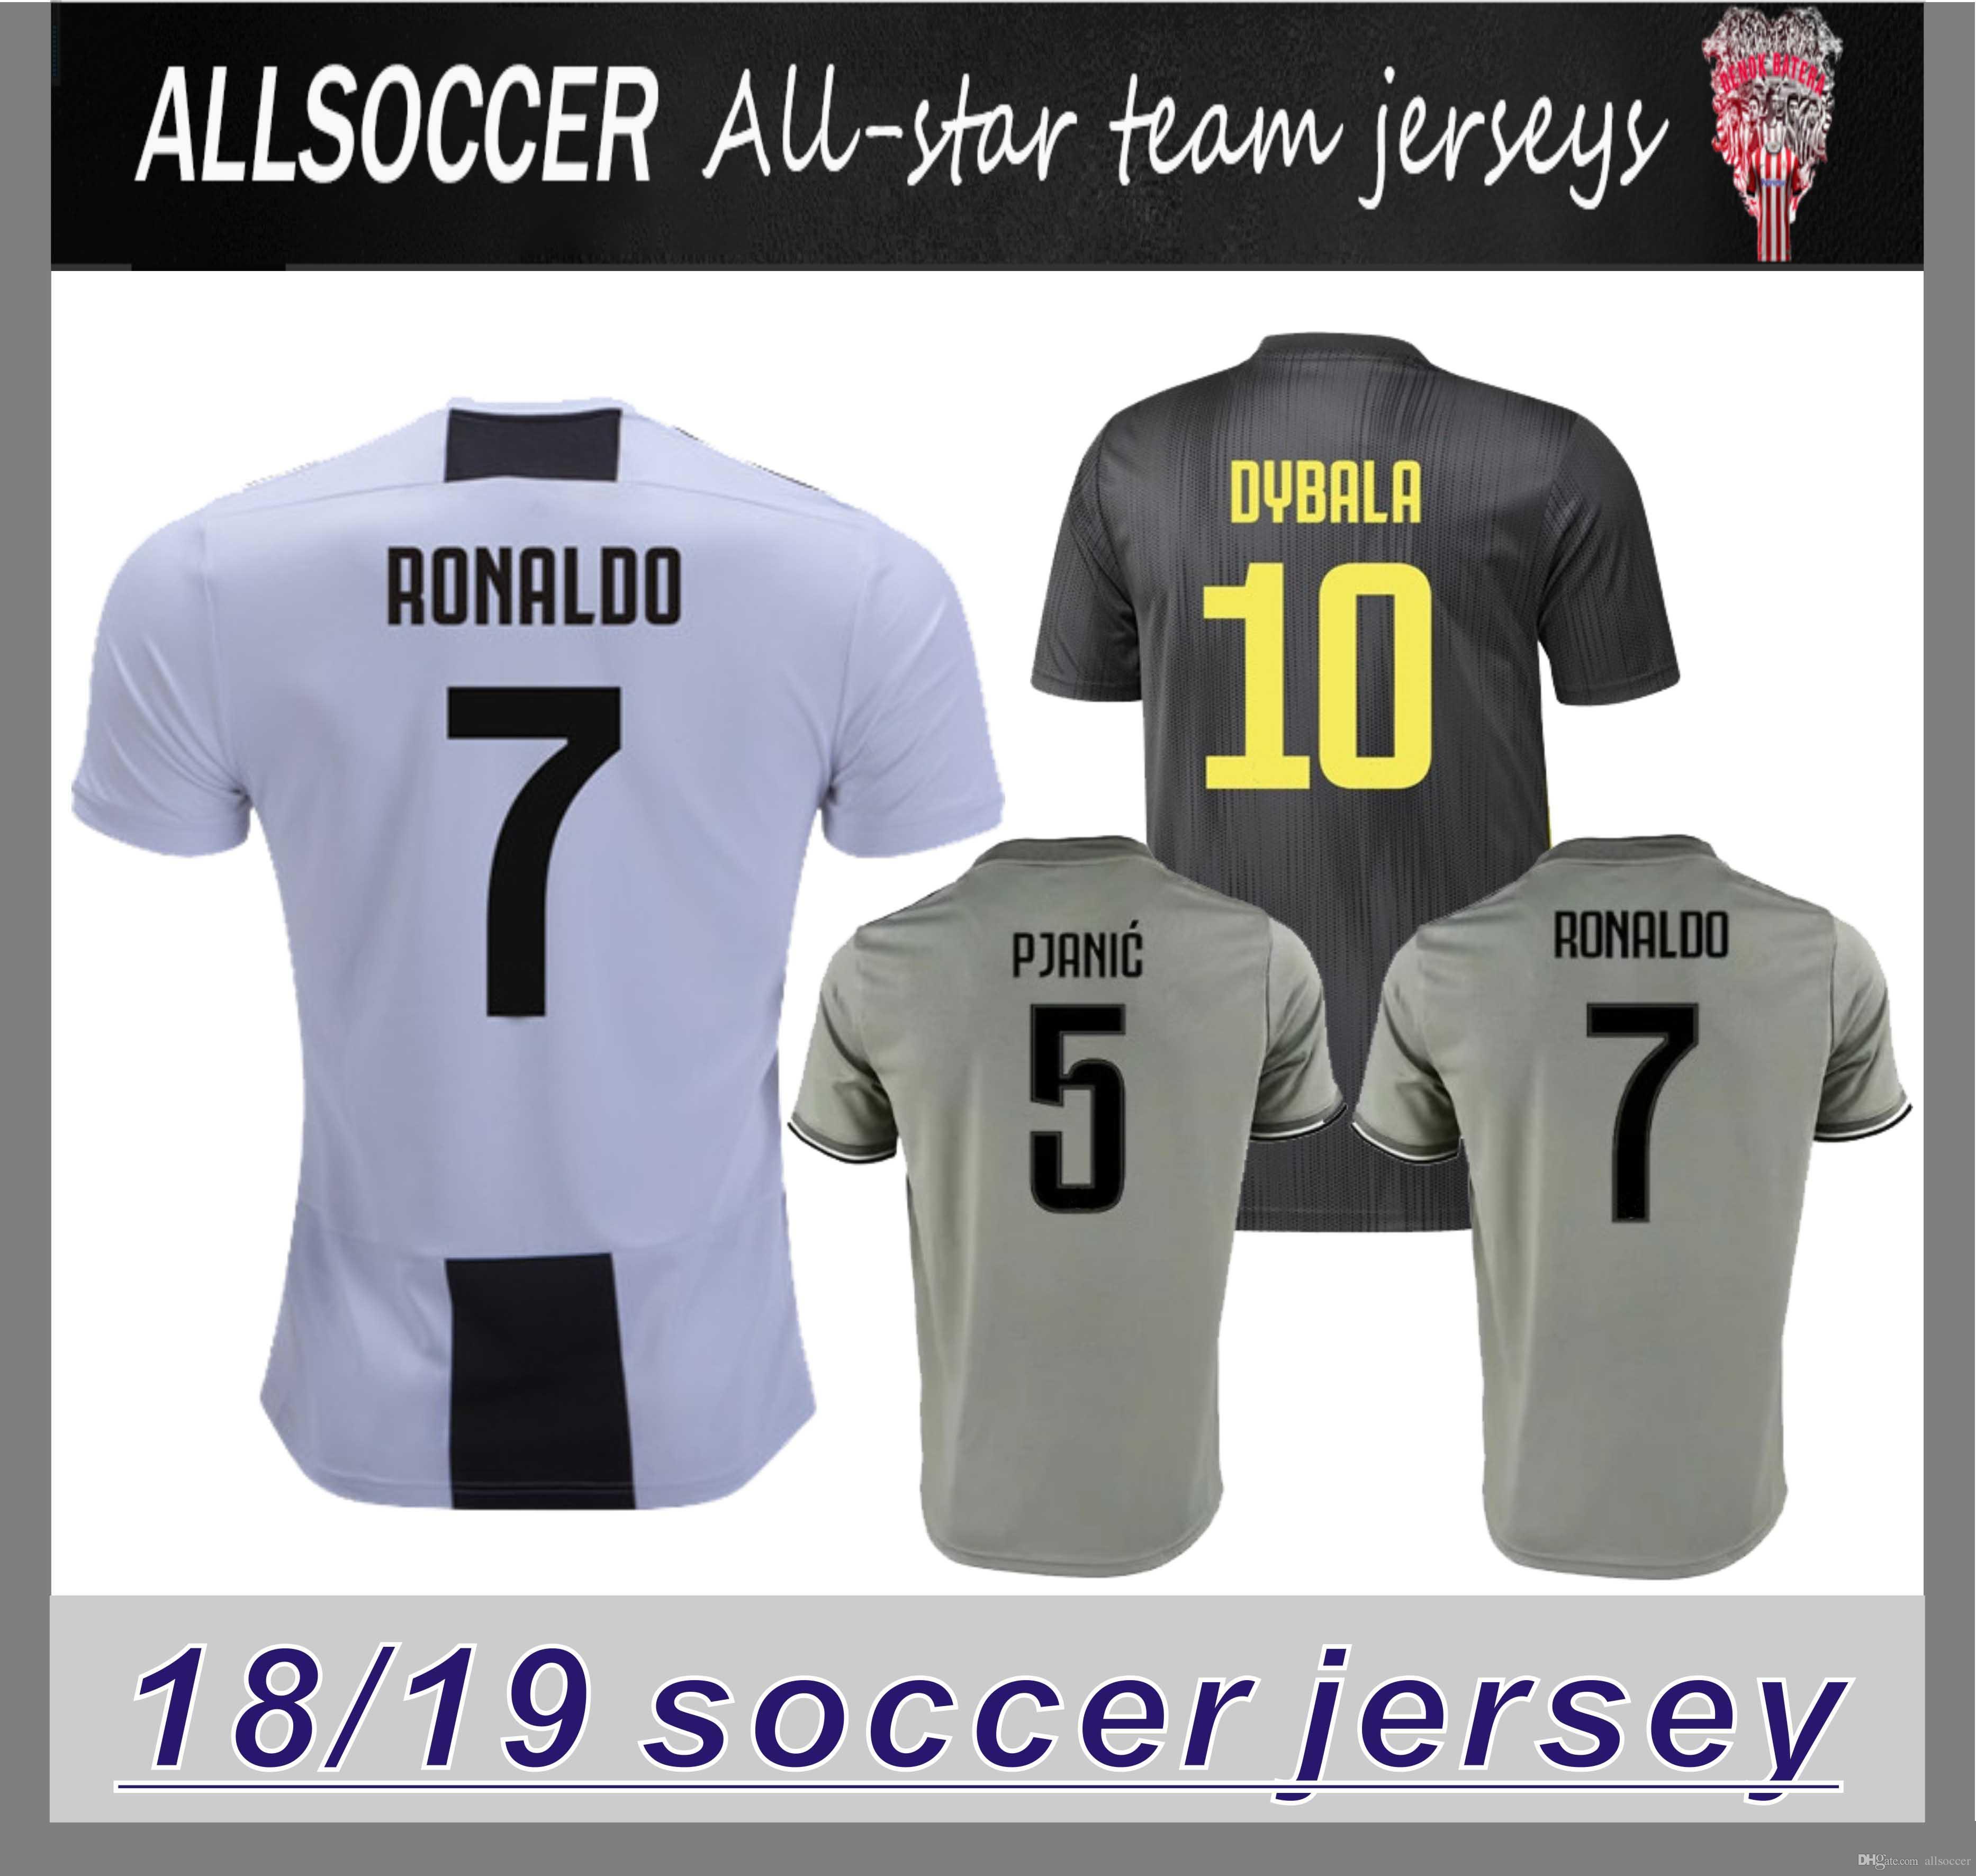 f22d8538a 2019 7 RONALDO 18 19 Soccer Jerseys Dybala HIGUAIN Tshirts CHIELLINI Costa  KHEDIRA Cuadrado PJANIC Manzukic 2019 Top Quality Jersey From Allsoccer